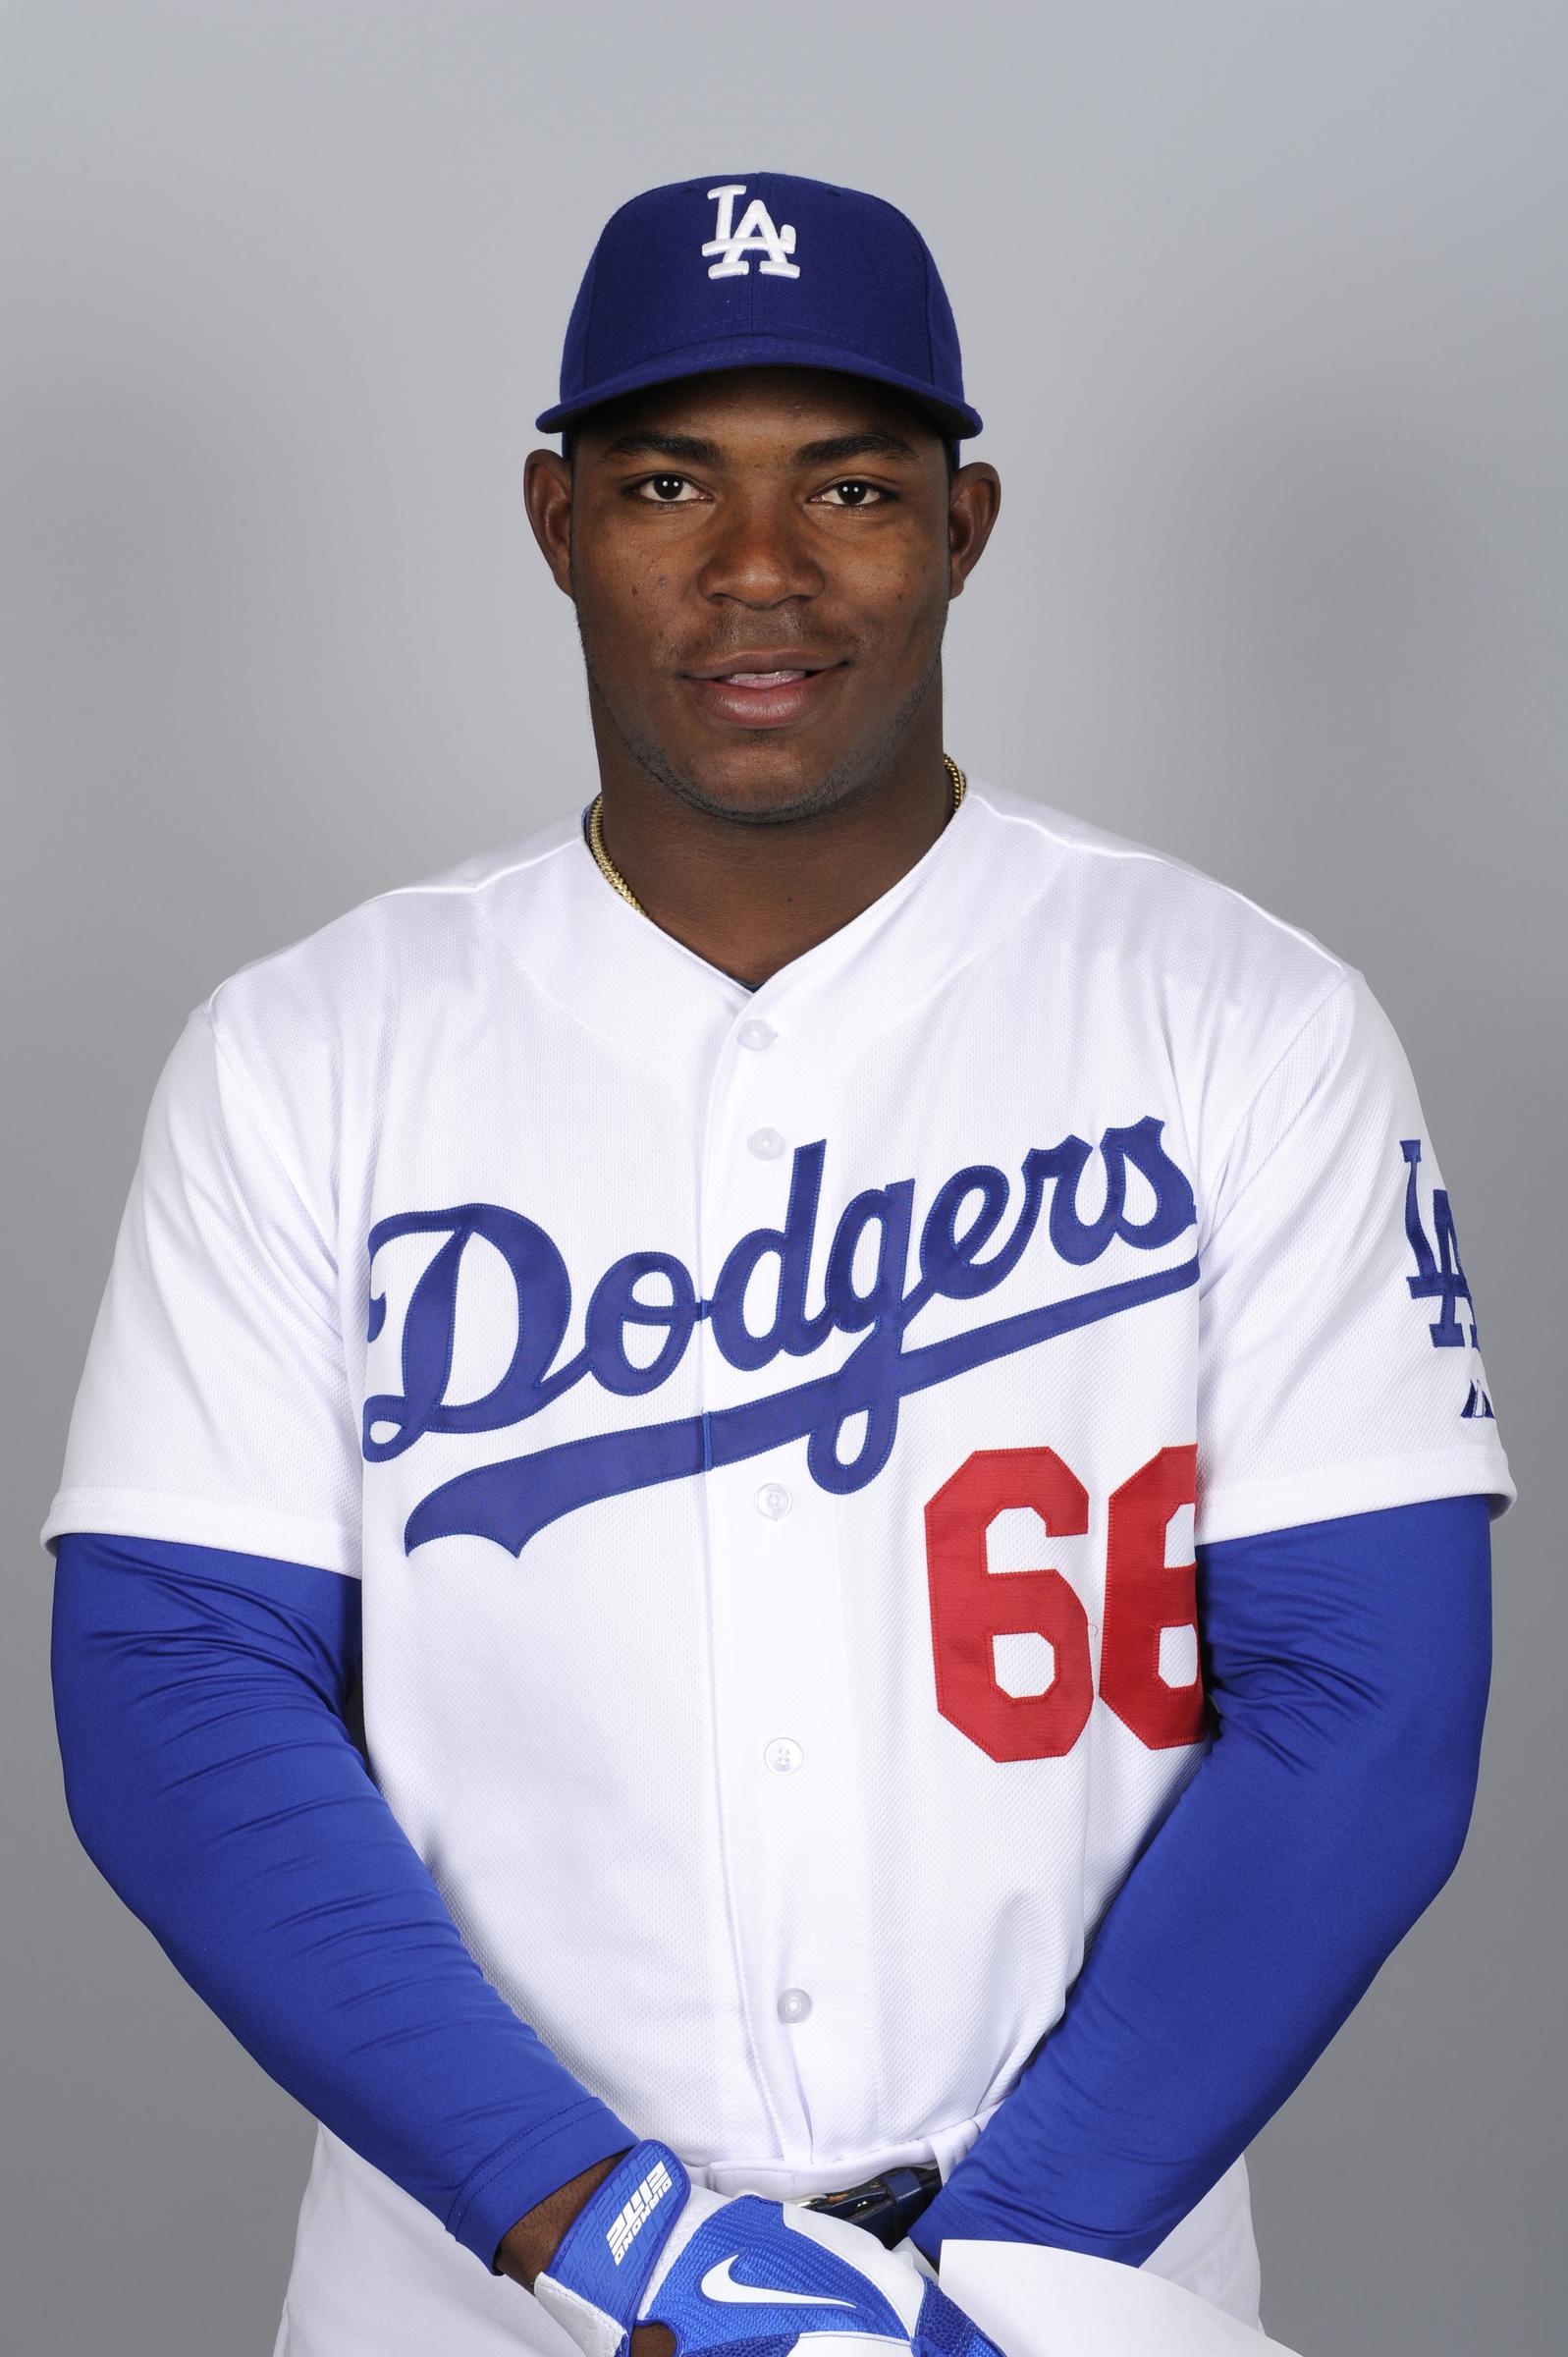 Dodgers Yasiel Puig